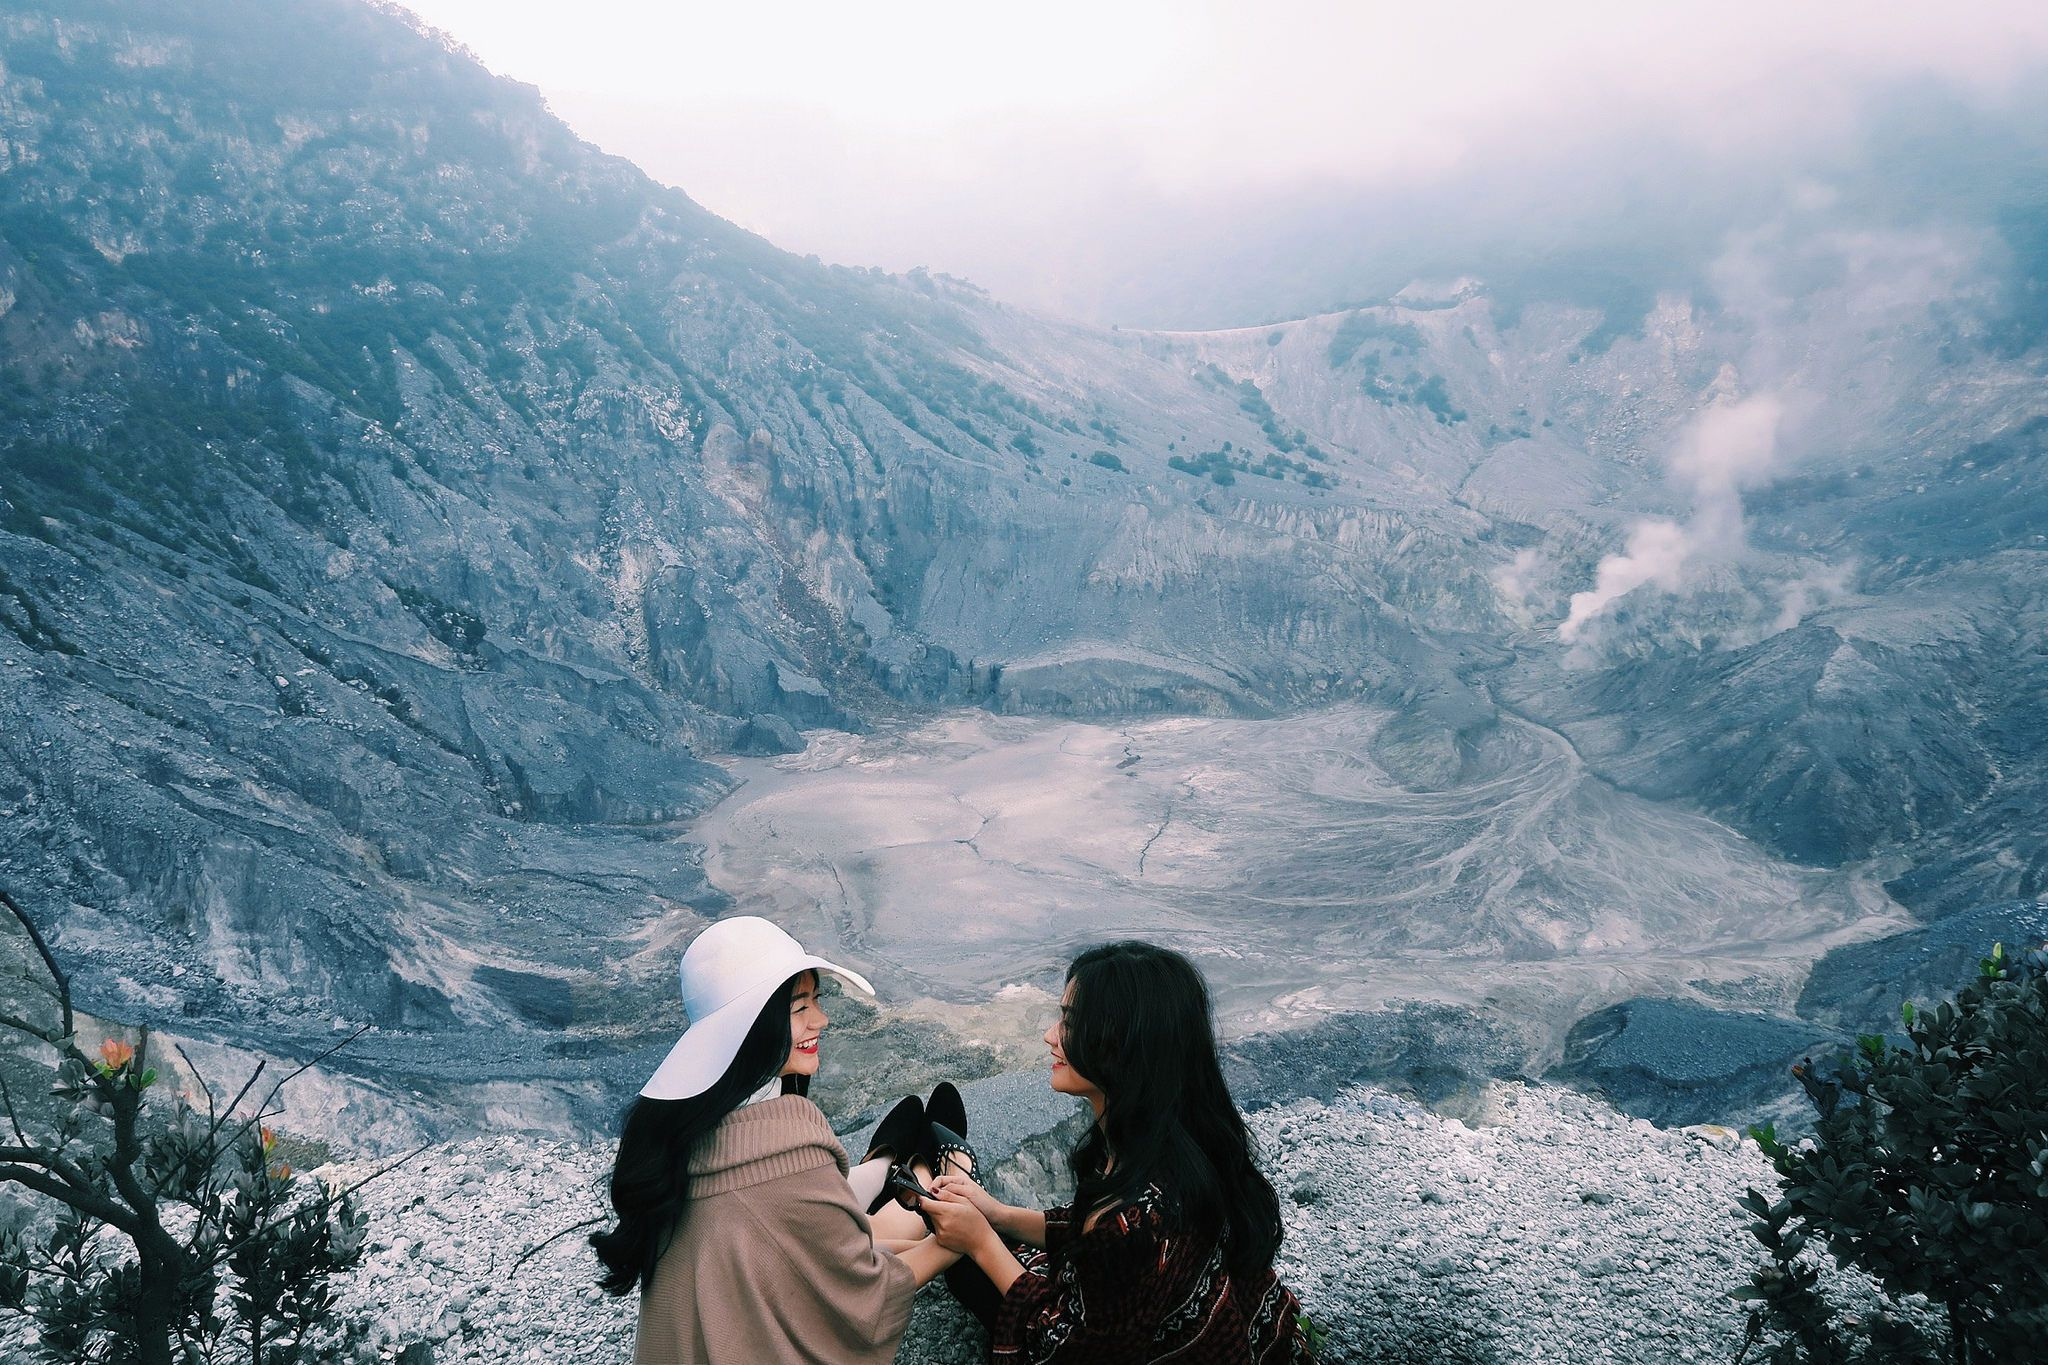 Tebing Keraton Bandung West Java Indonesia Tebingkeraton Jawabarat Pinterest Taman